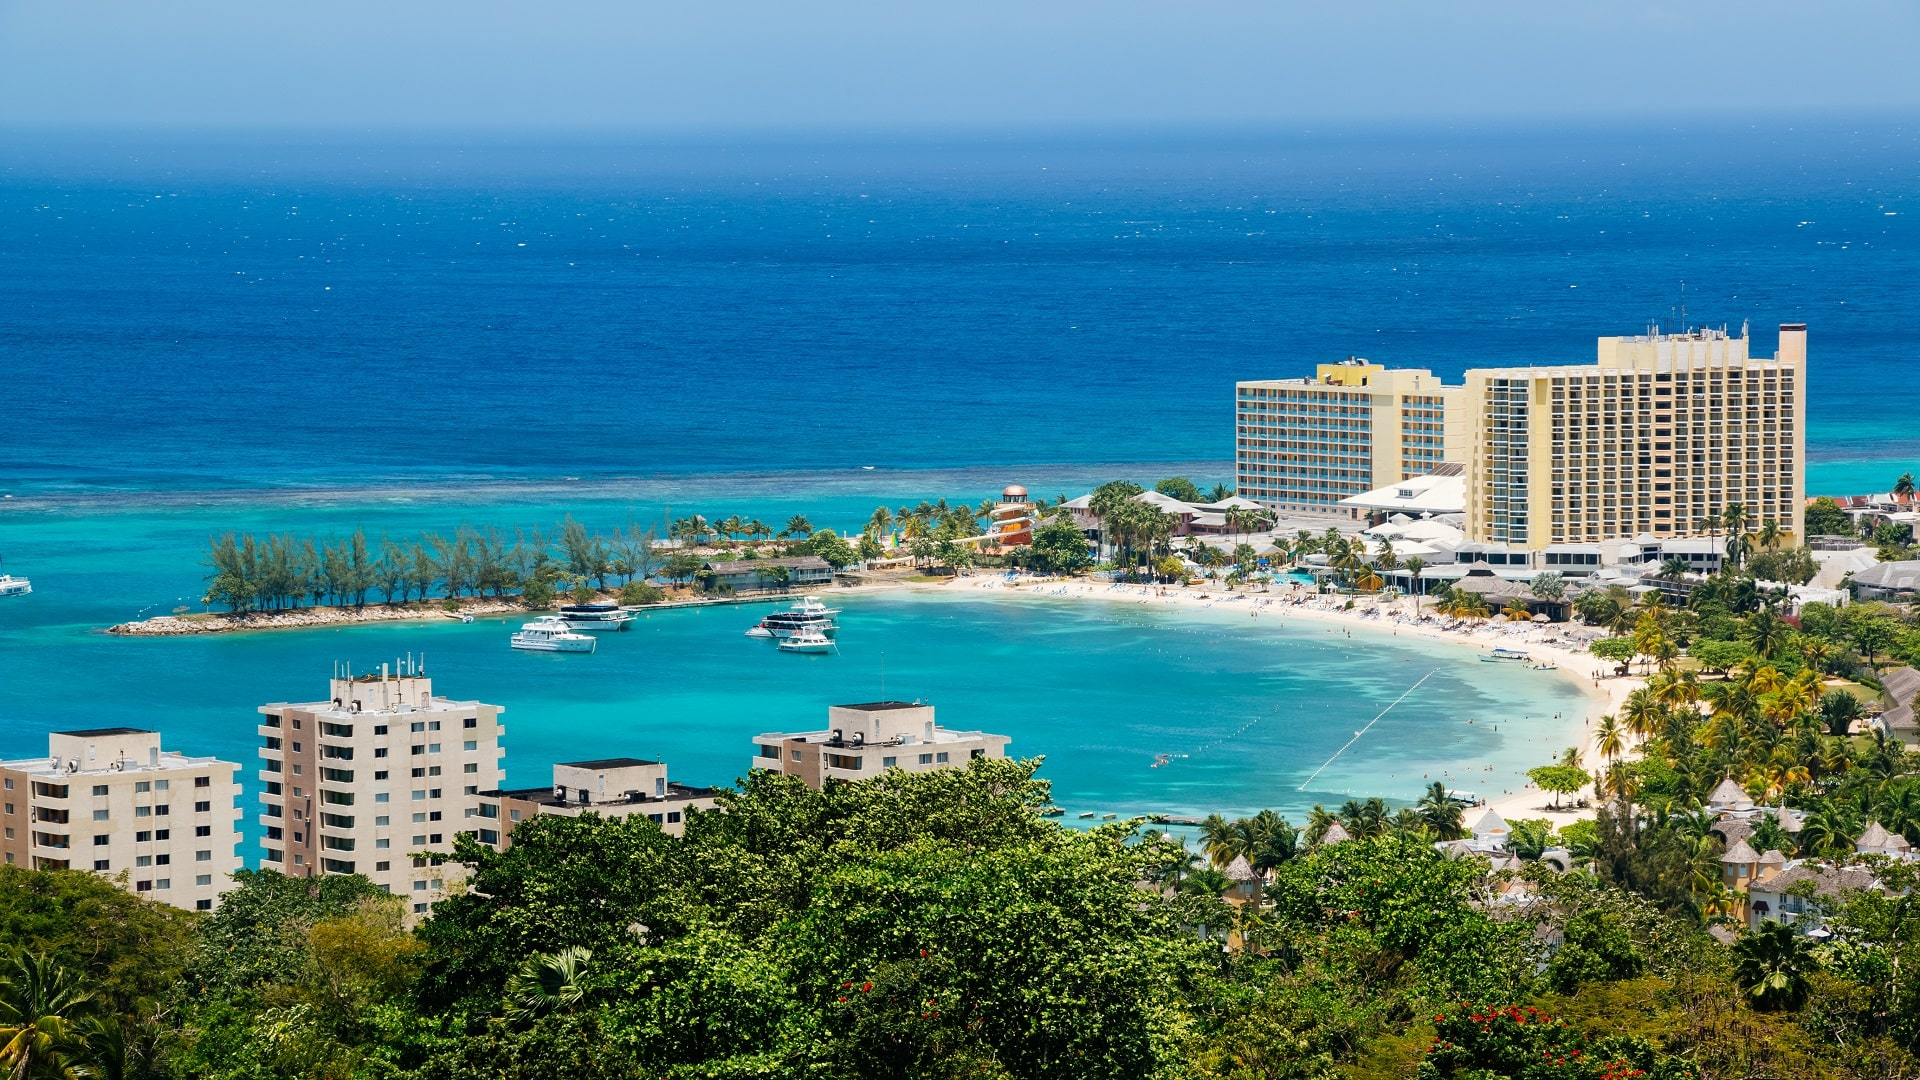 Ocho Rios Bay, Jamaica